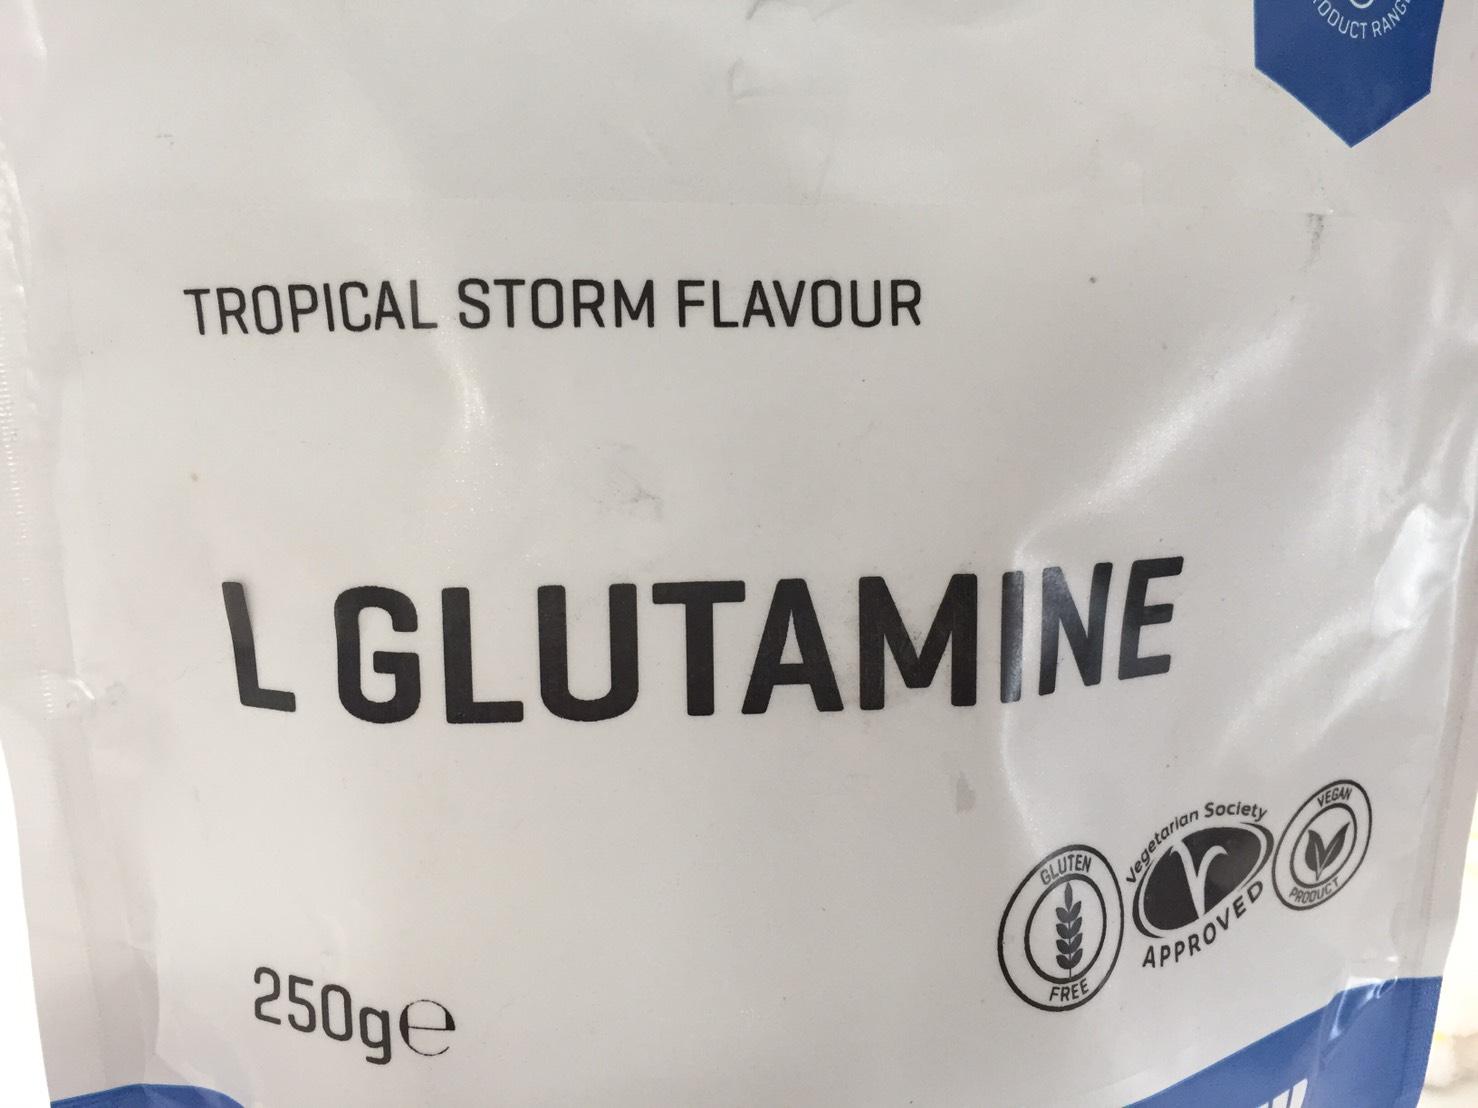 L-グルタミン「TROPICAL STORM FLAVOUR(トロピカル味)」